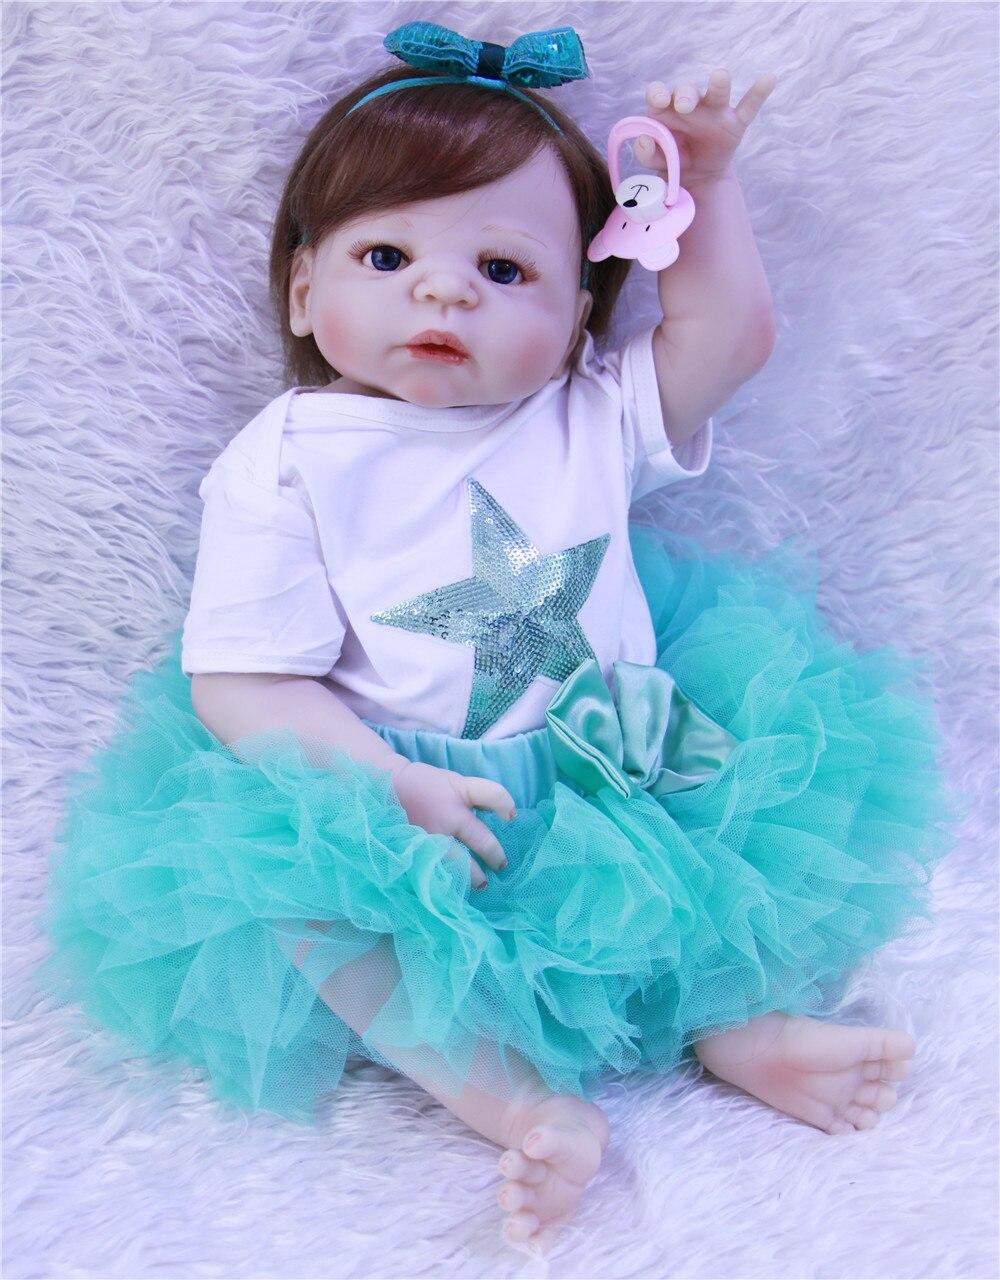 DollMai doll reborn princess girl full silicone body reborn babies alive 23rooted hair can bathe bebes reborn menina bonecas